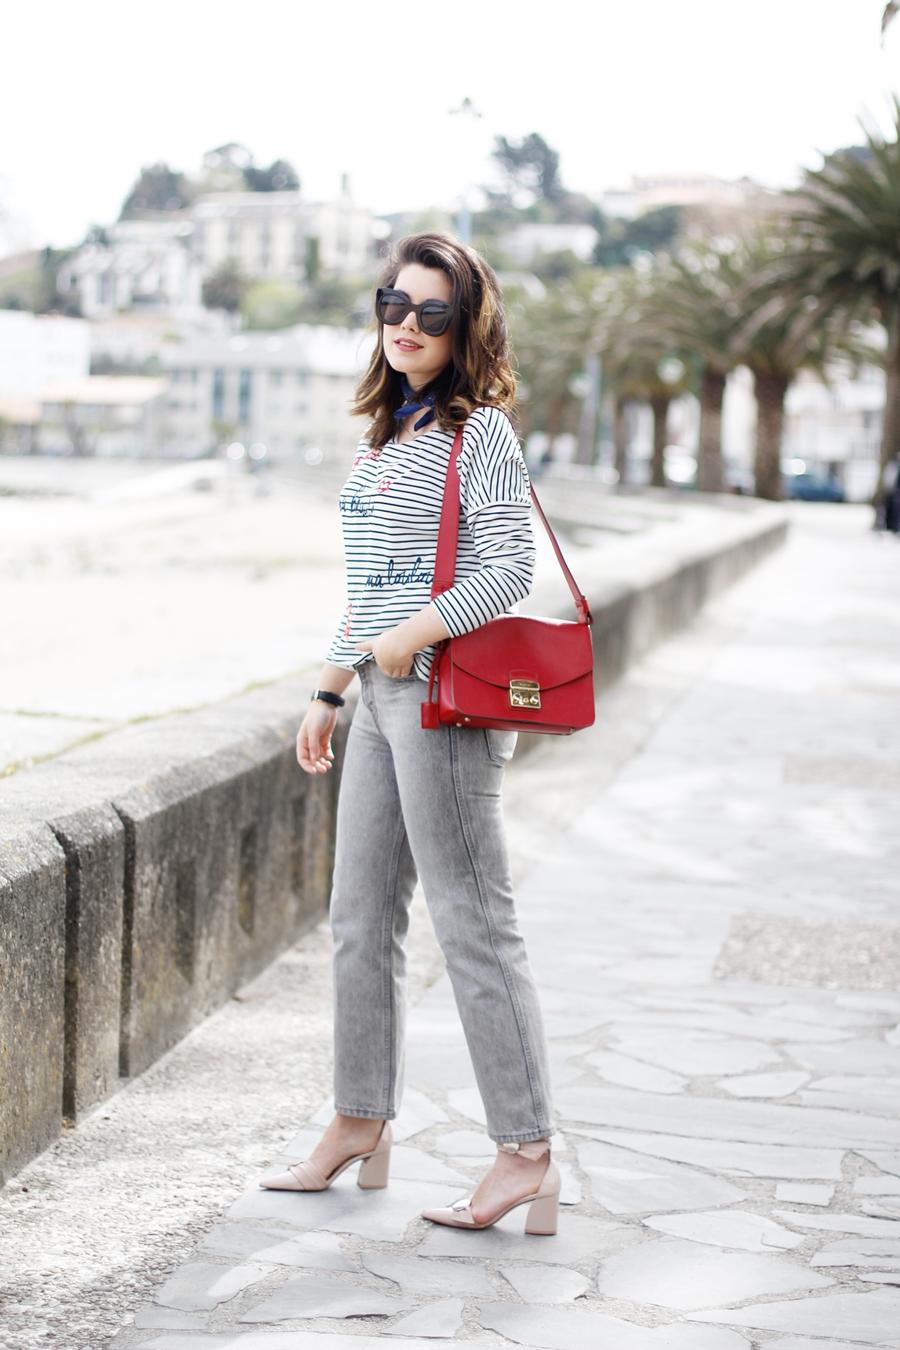 estilo parisino camiseta rayas gafas celine y stiletto uterque myblueberrynightsblog streetstyle